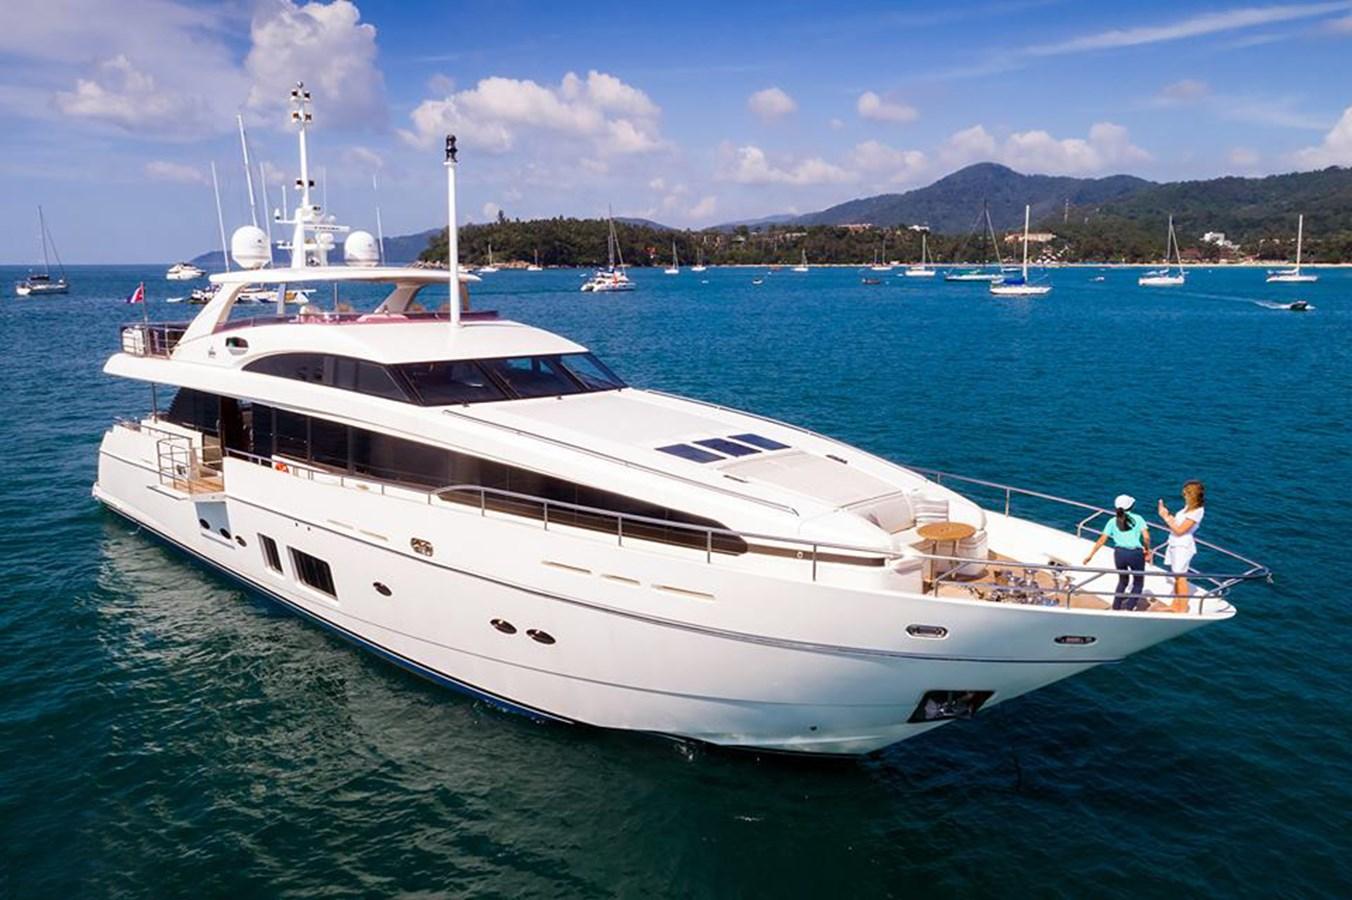 Princess 32M yacht for sale